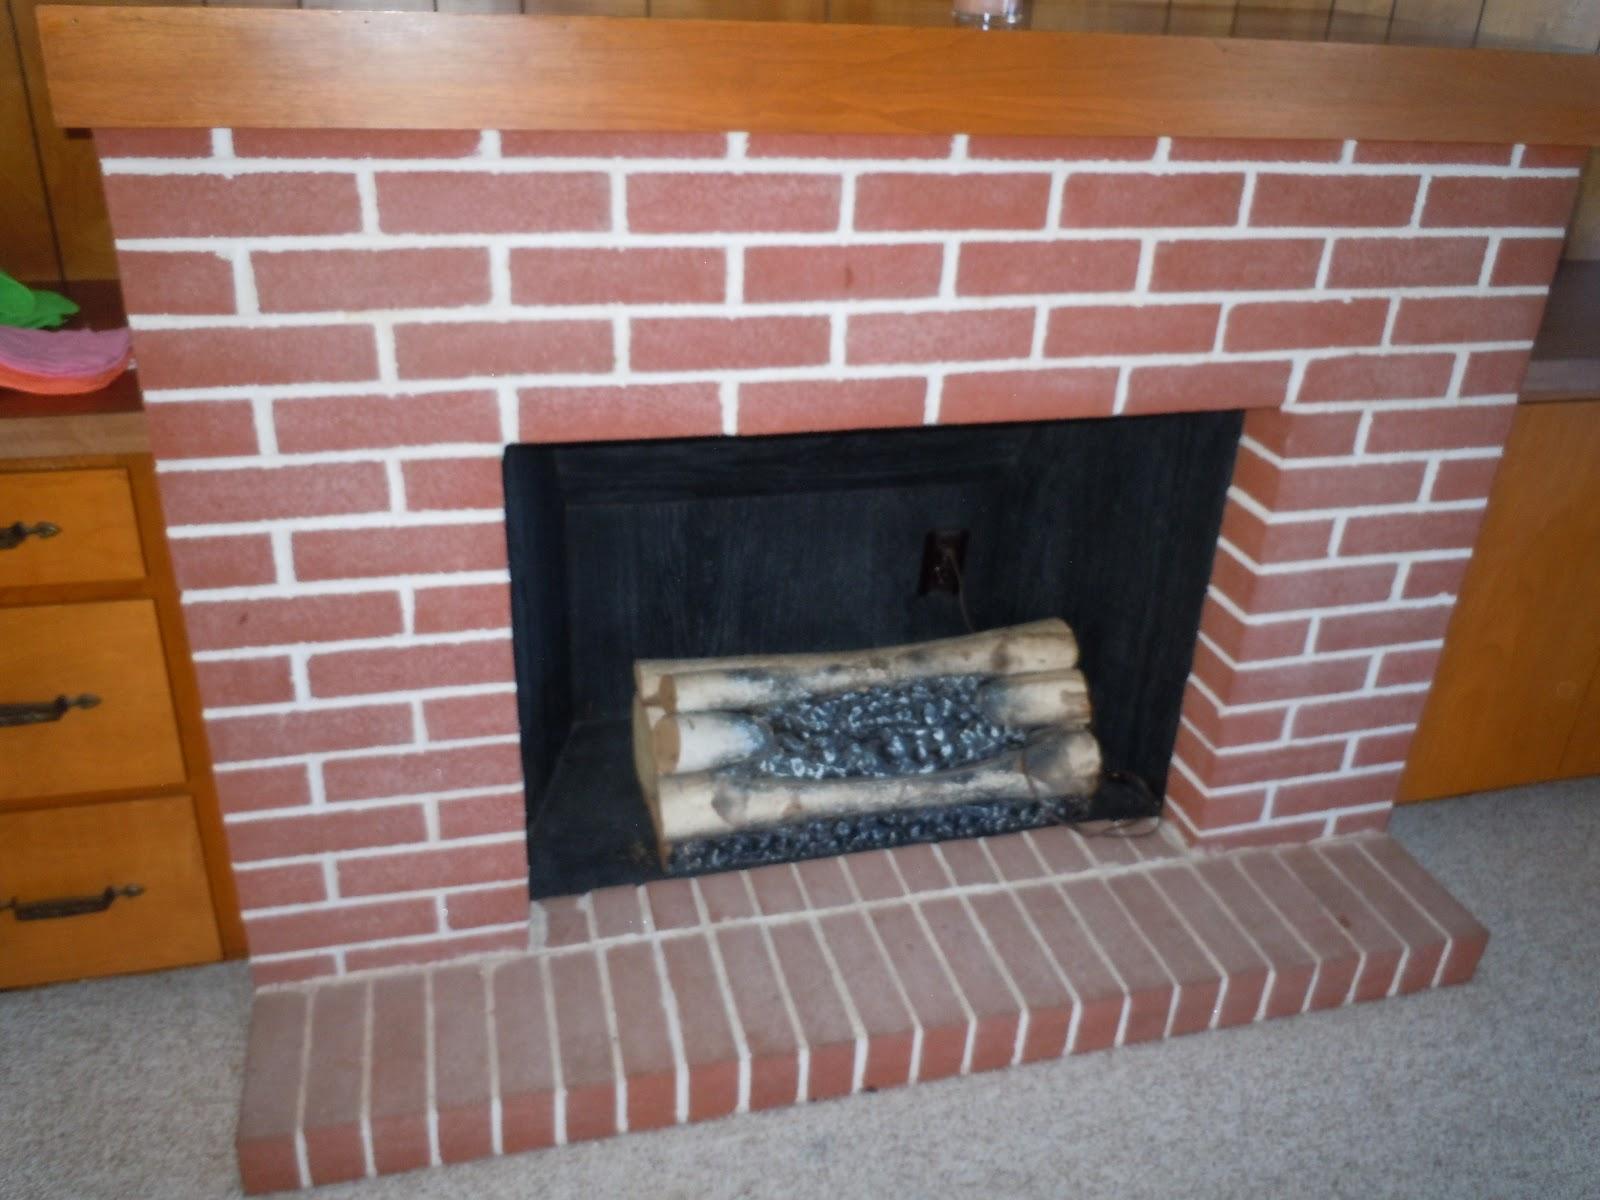 plum tree place fireplace dismantle